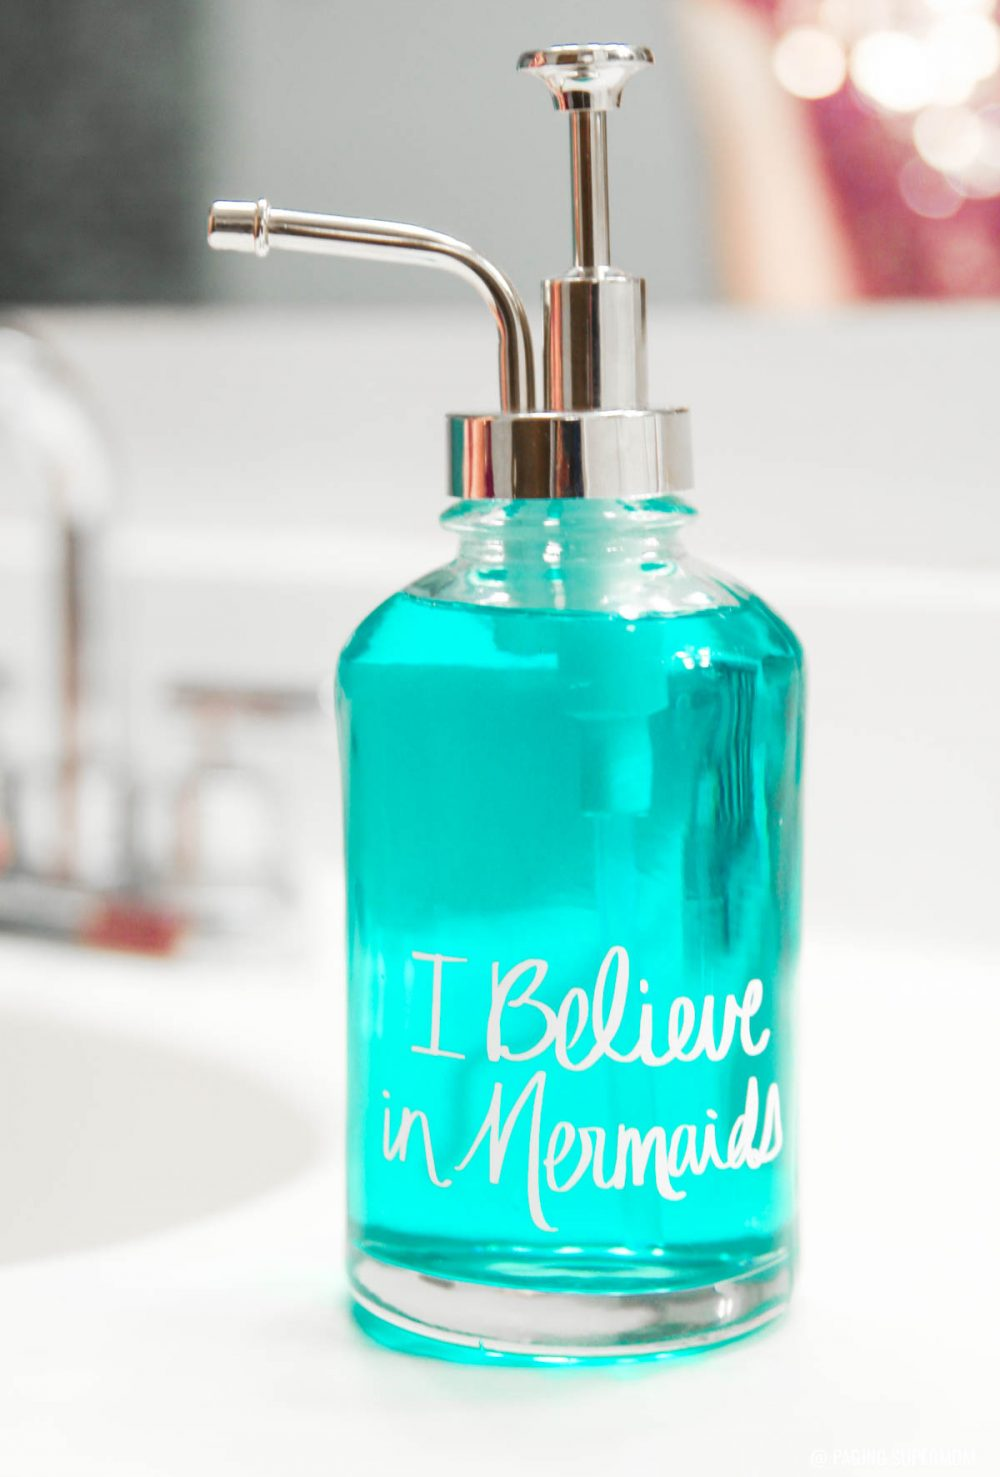 Mermaids Bathroom Decor ideas. See how to make this easy DIY Mermaid Soap Pump via @PagingSupermom